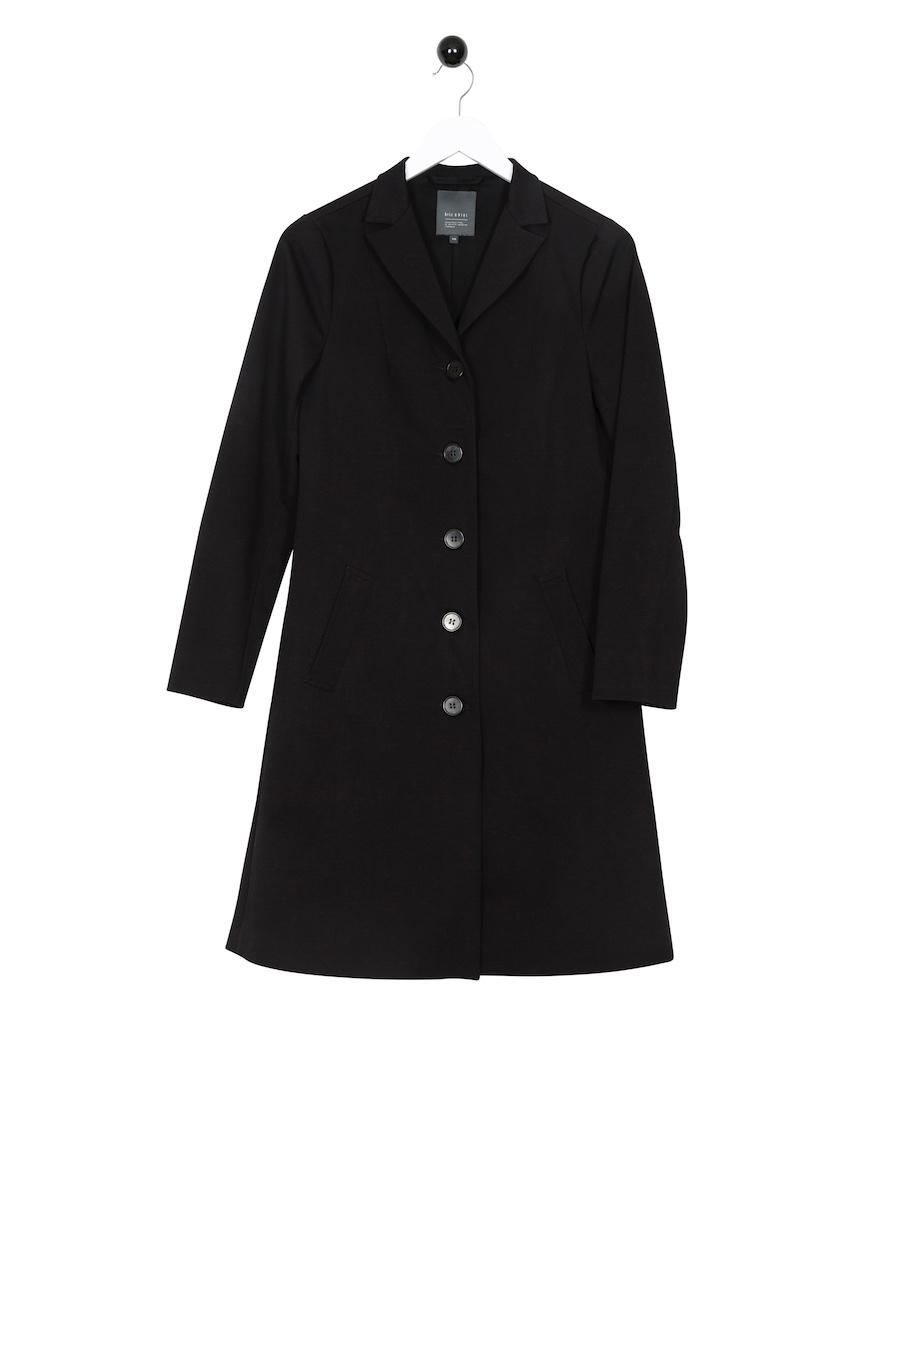 Obsidian Coat